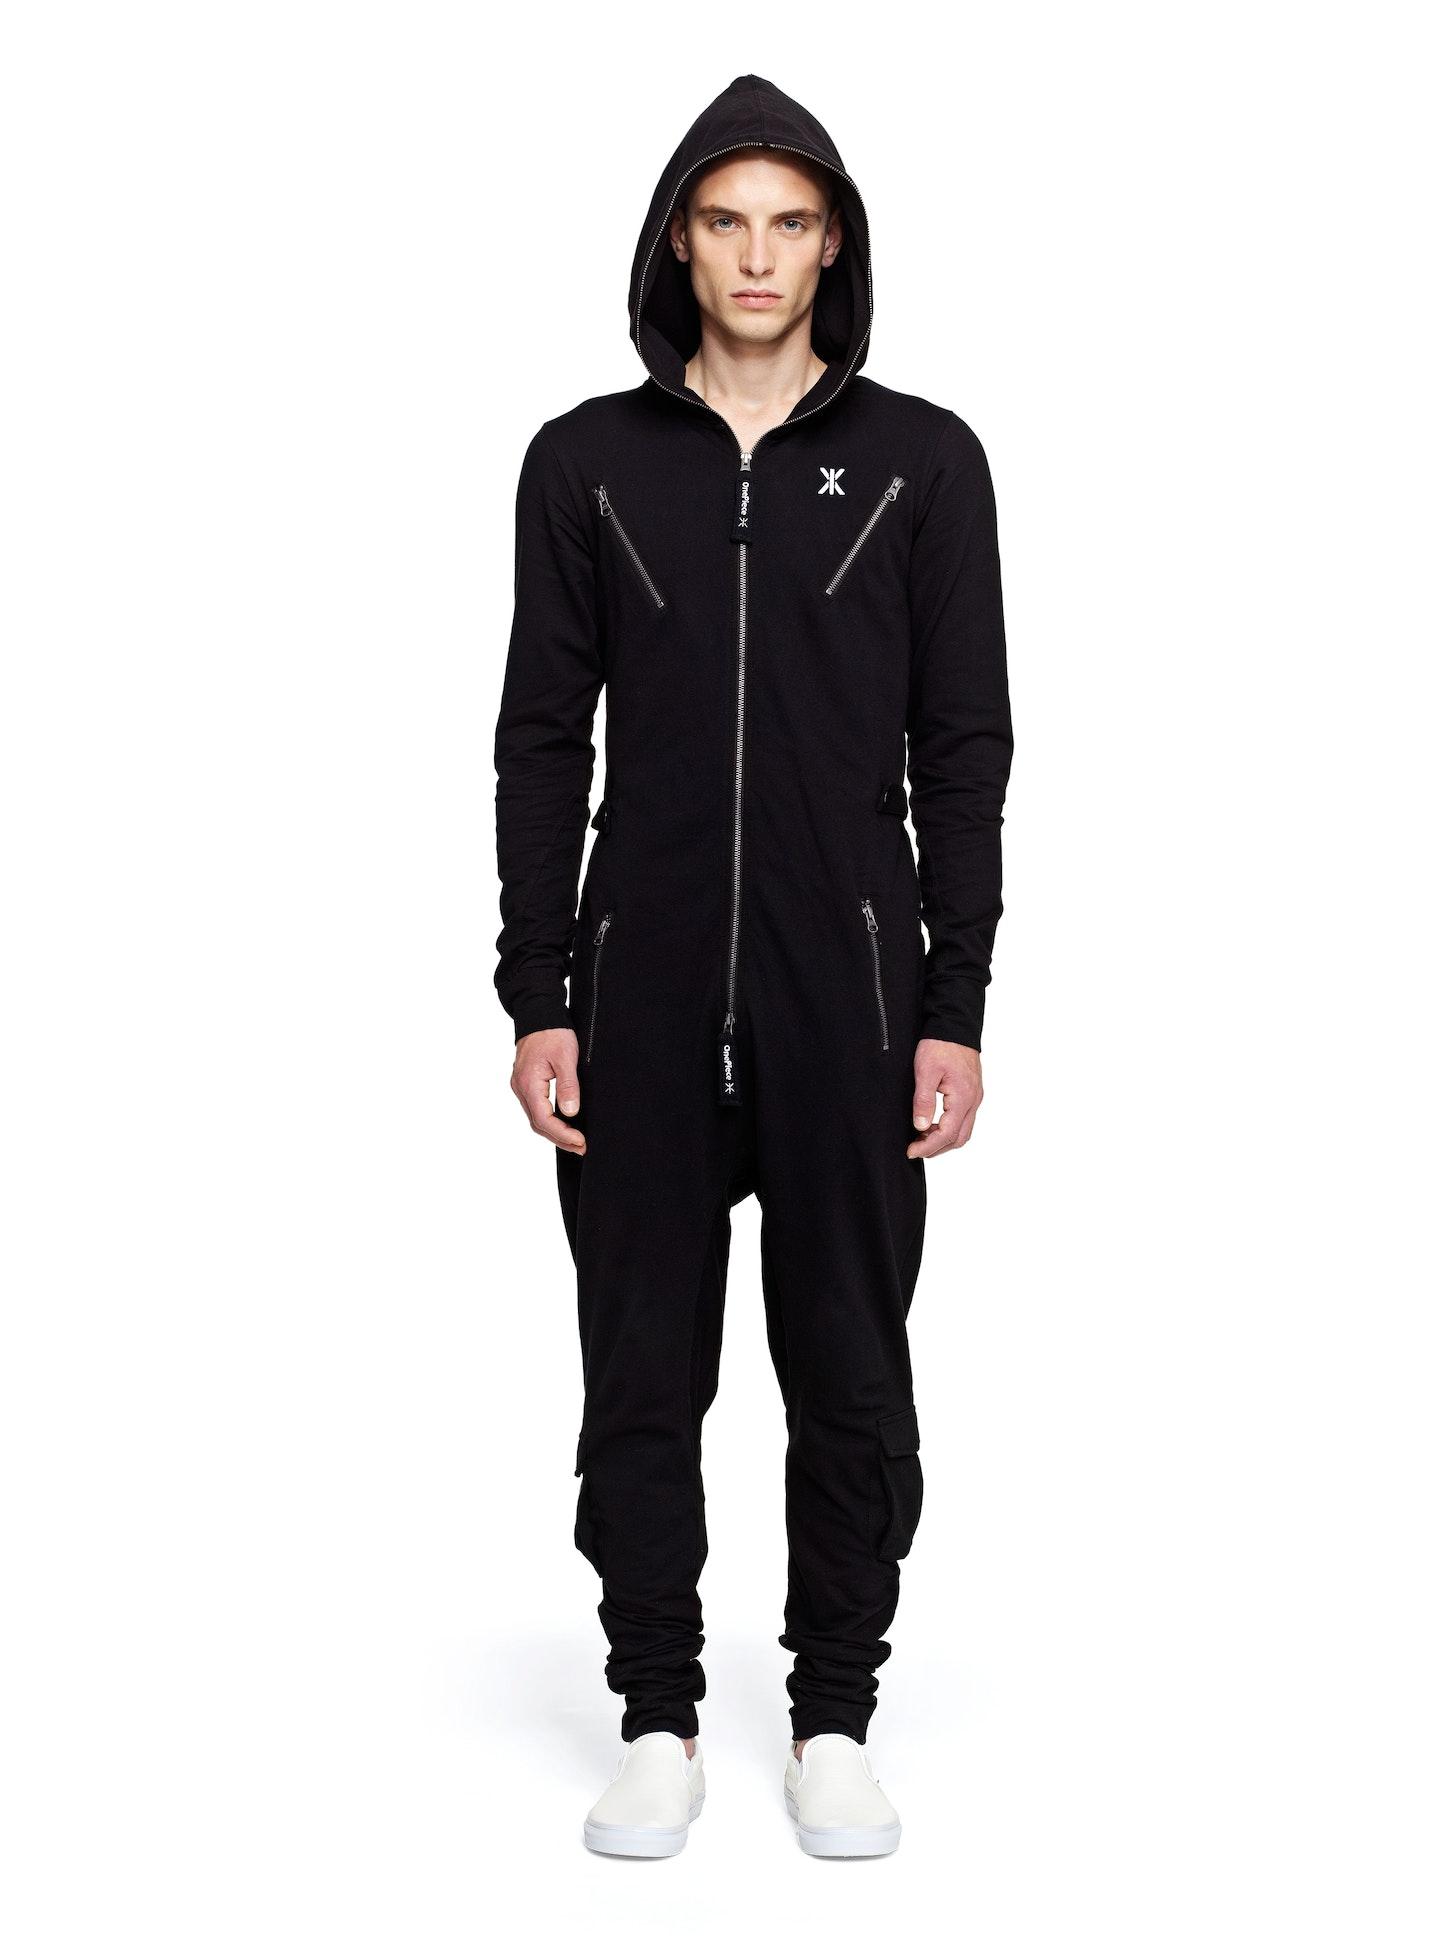 air jumpsuit black onesie onepiece uk